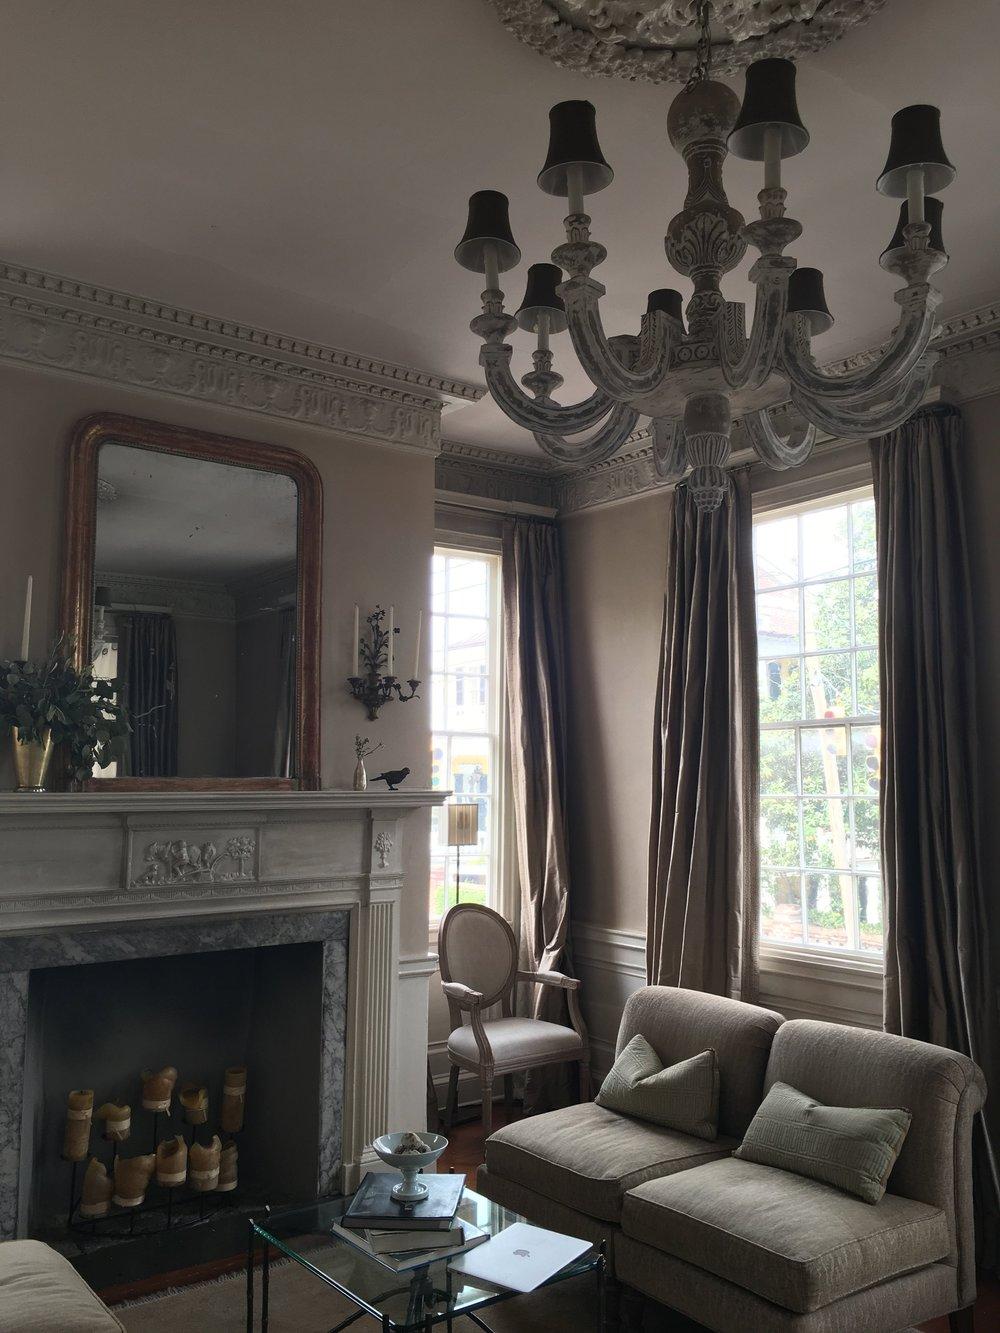 Wanderlust-blog-Charleston-boutique-hotel-parlor